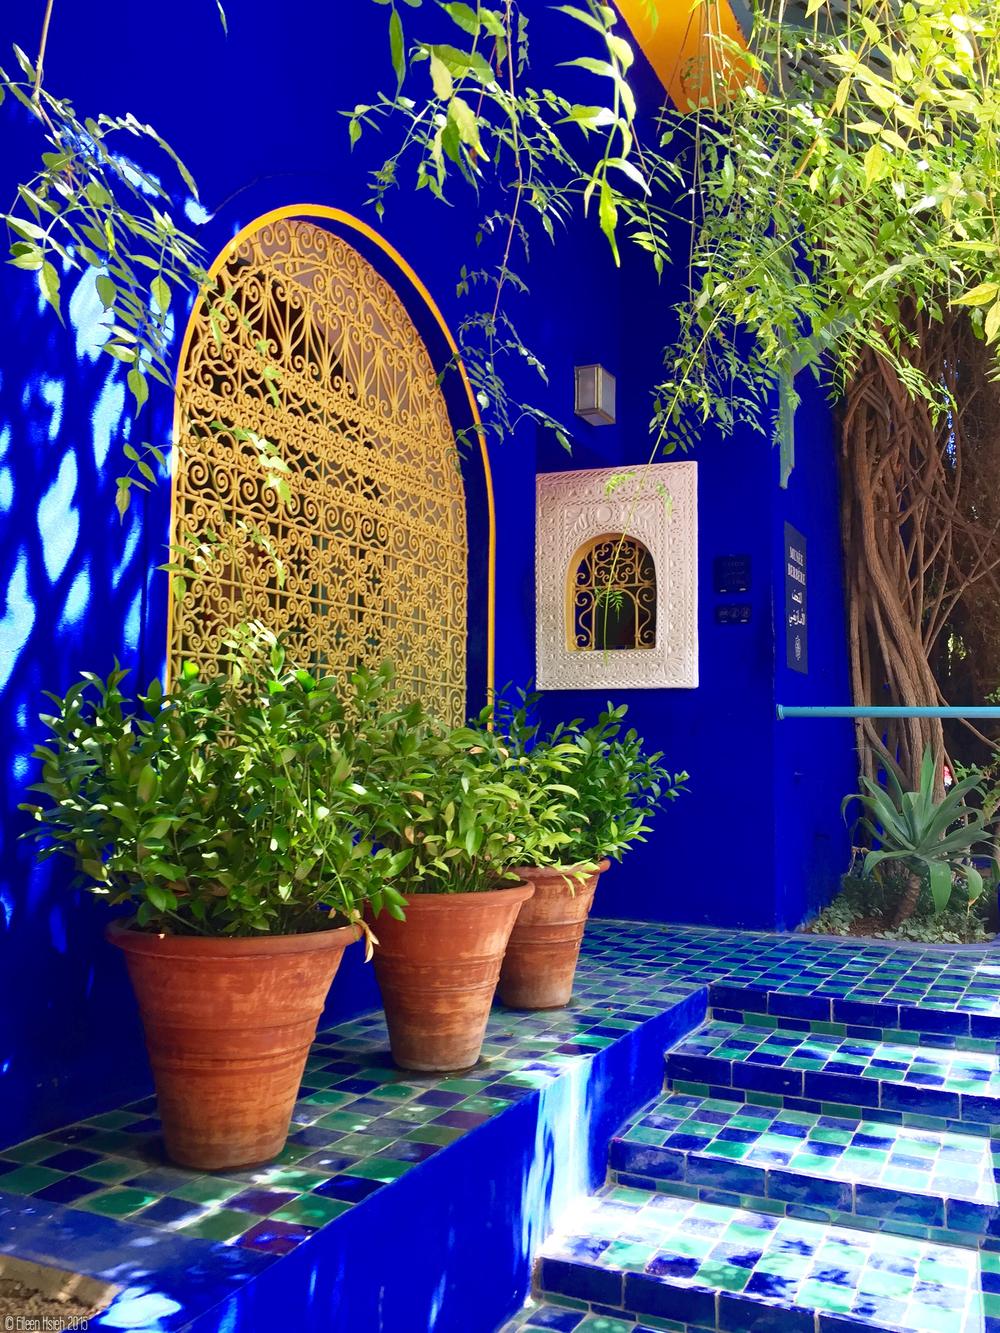 Entrance of the fabulous Berber Museum.值得一看的「柏柏爾人博物館」的入口。